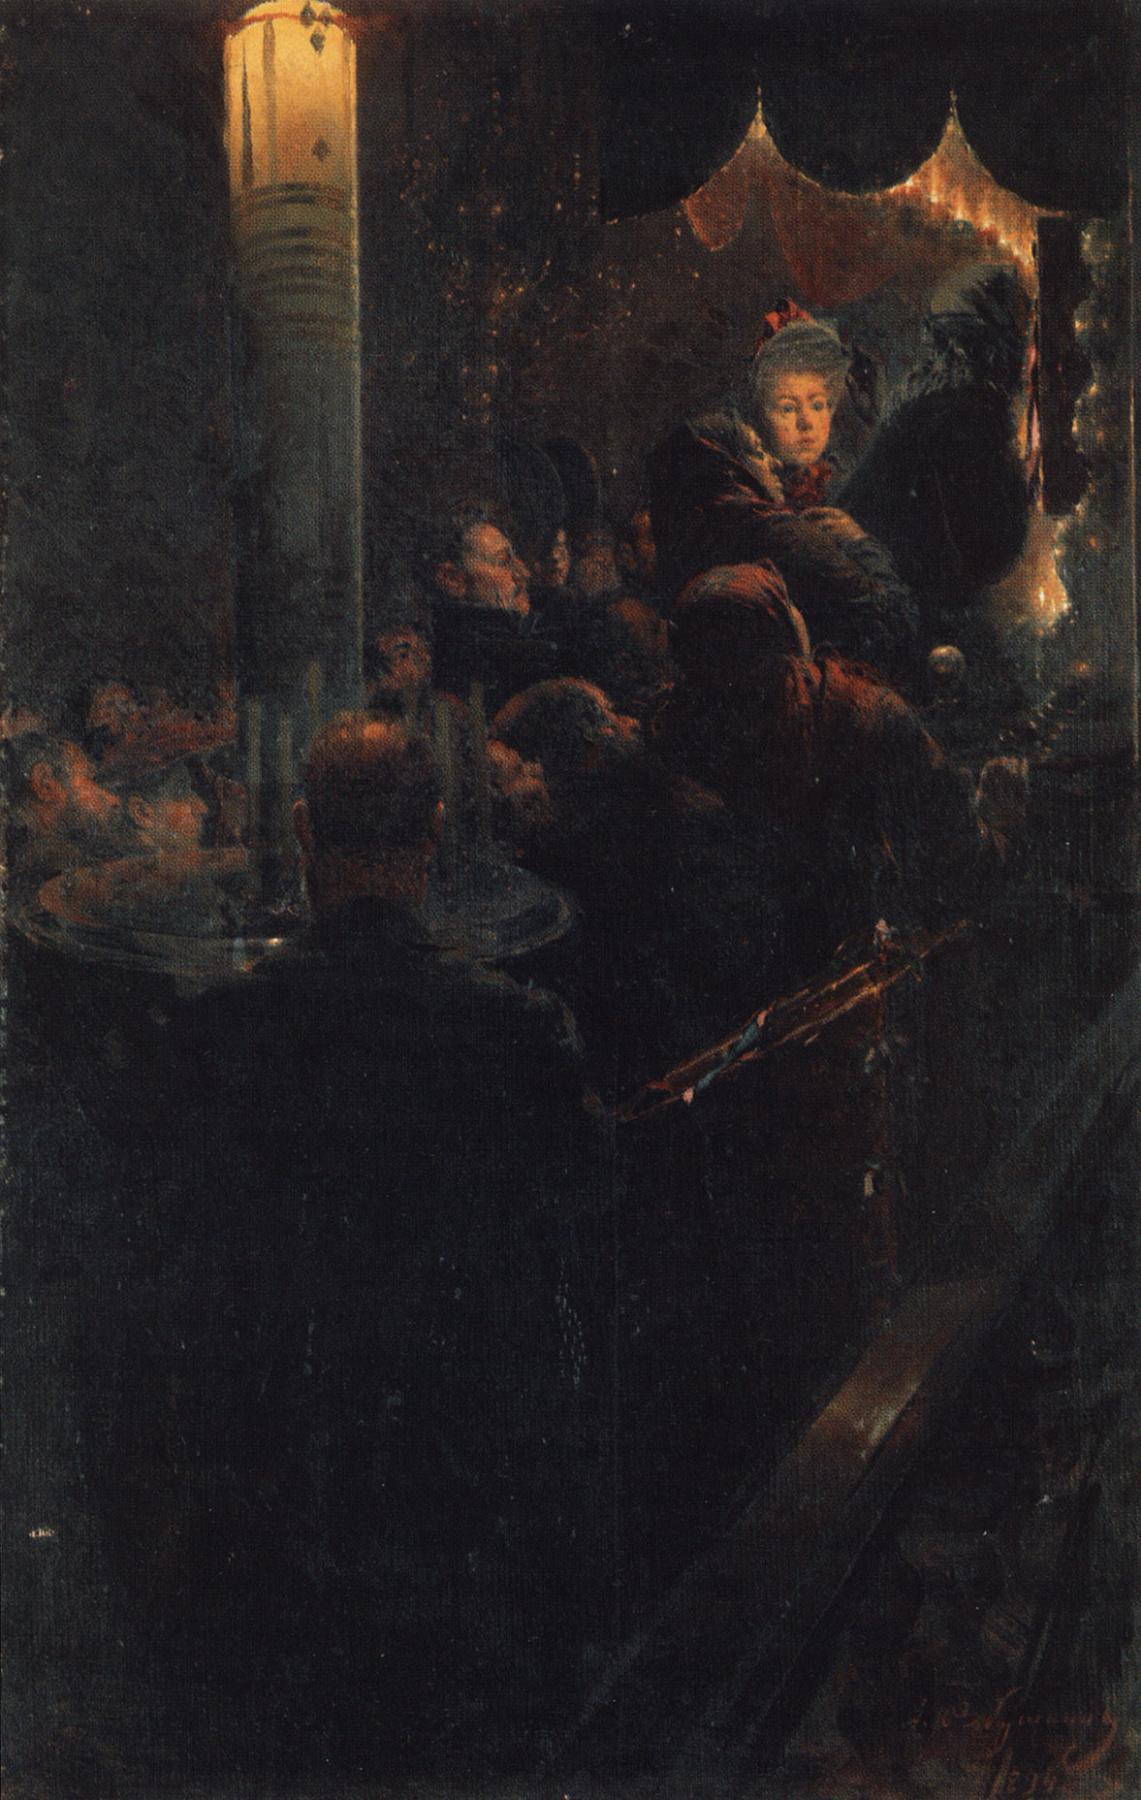 Andrei Petrovich Ryabushkin. At the miraculous icon. 1894